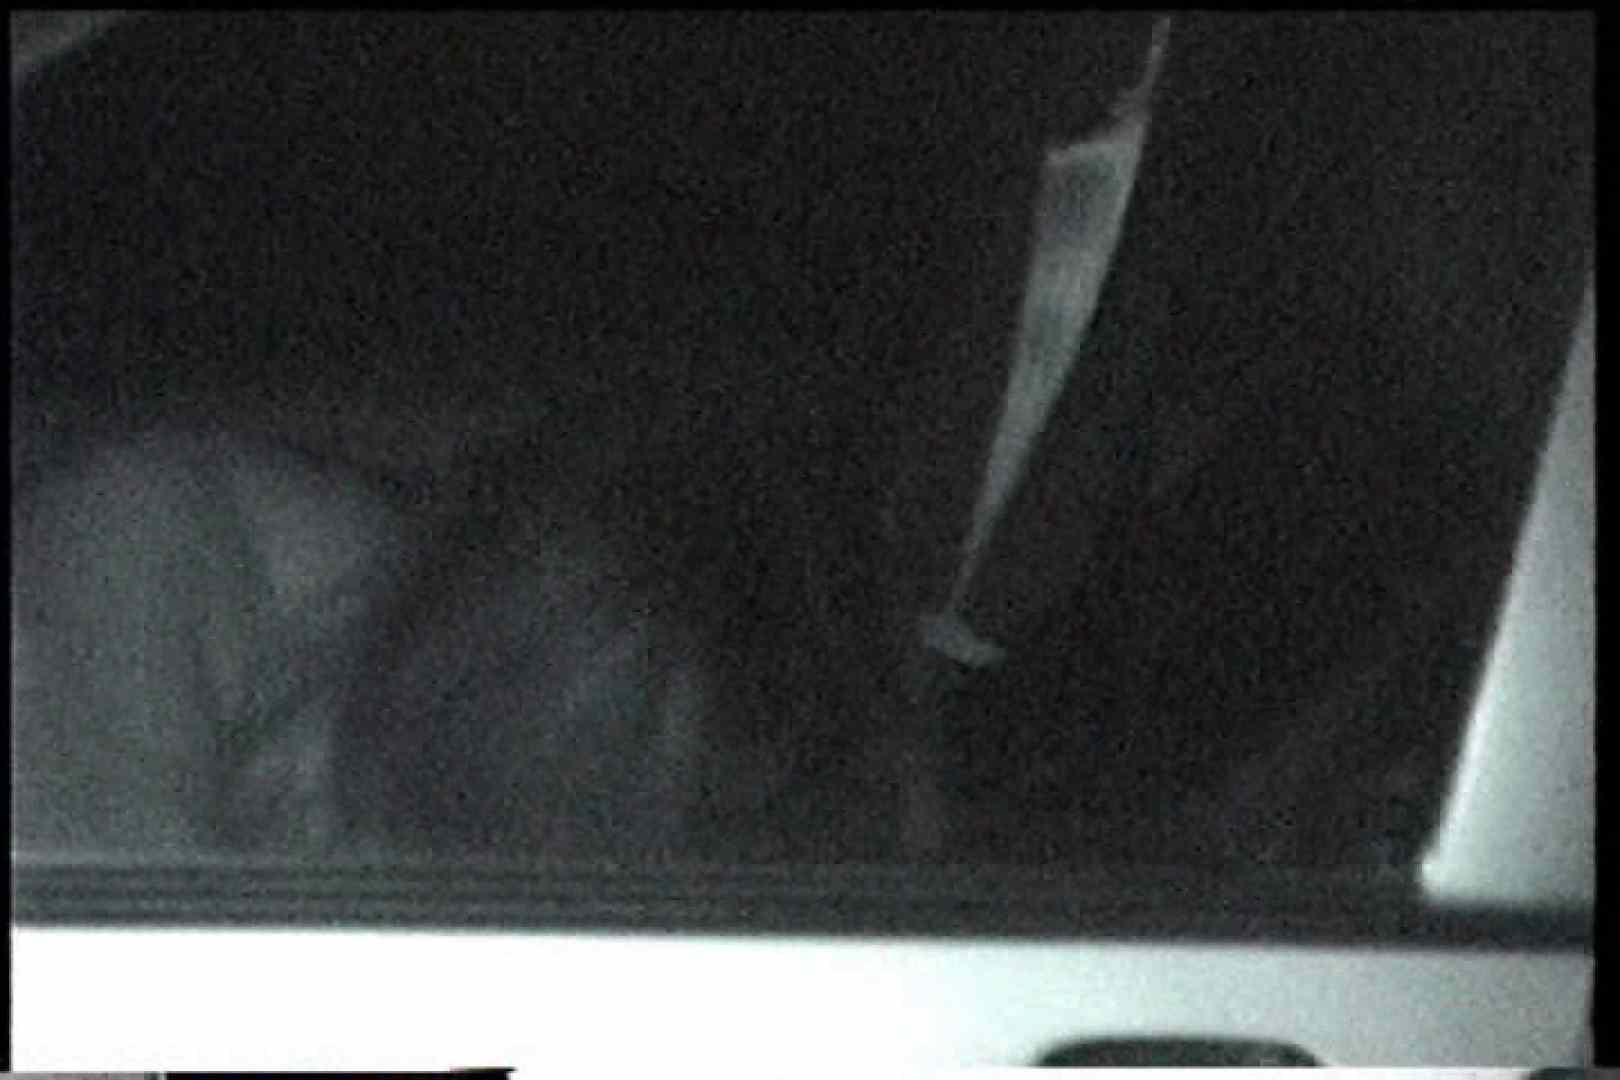 充血監督の深夜の運動会Vol.226 フェラ無修正 盗撮動画紹介 67画像 35